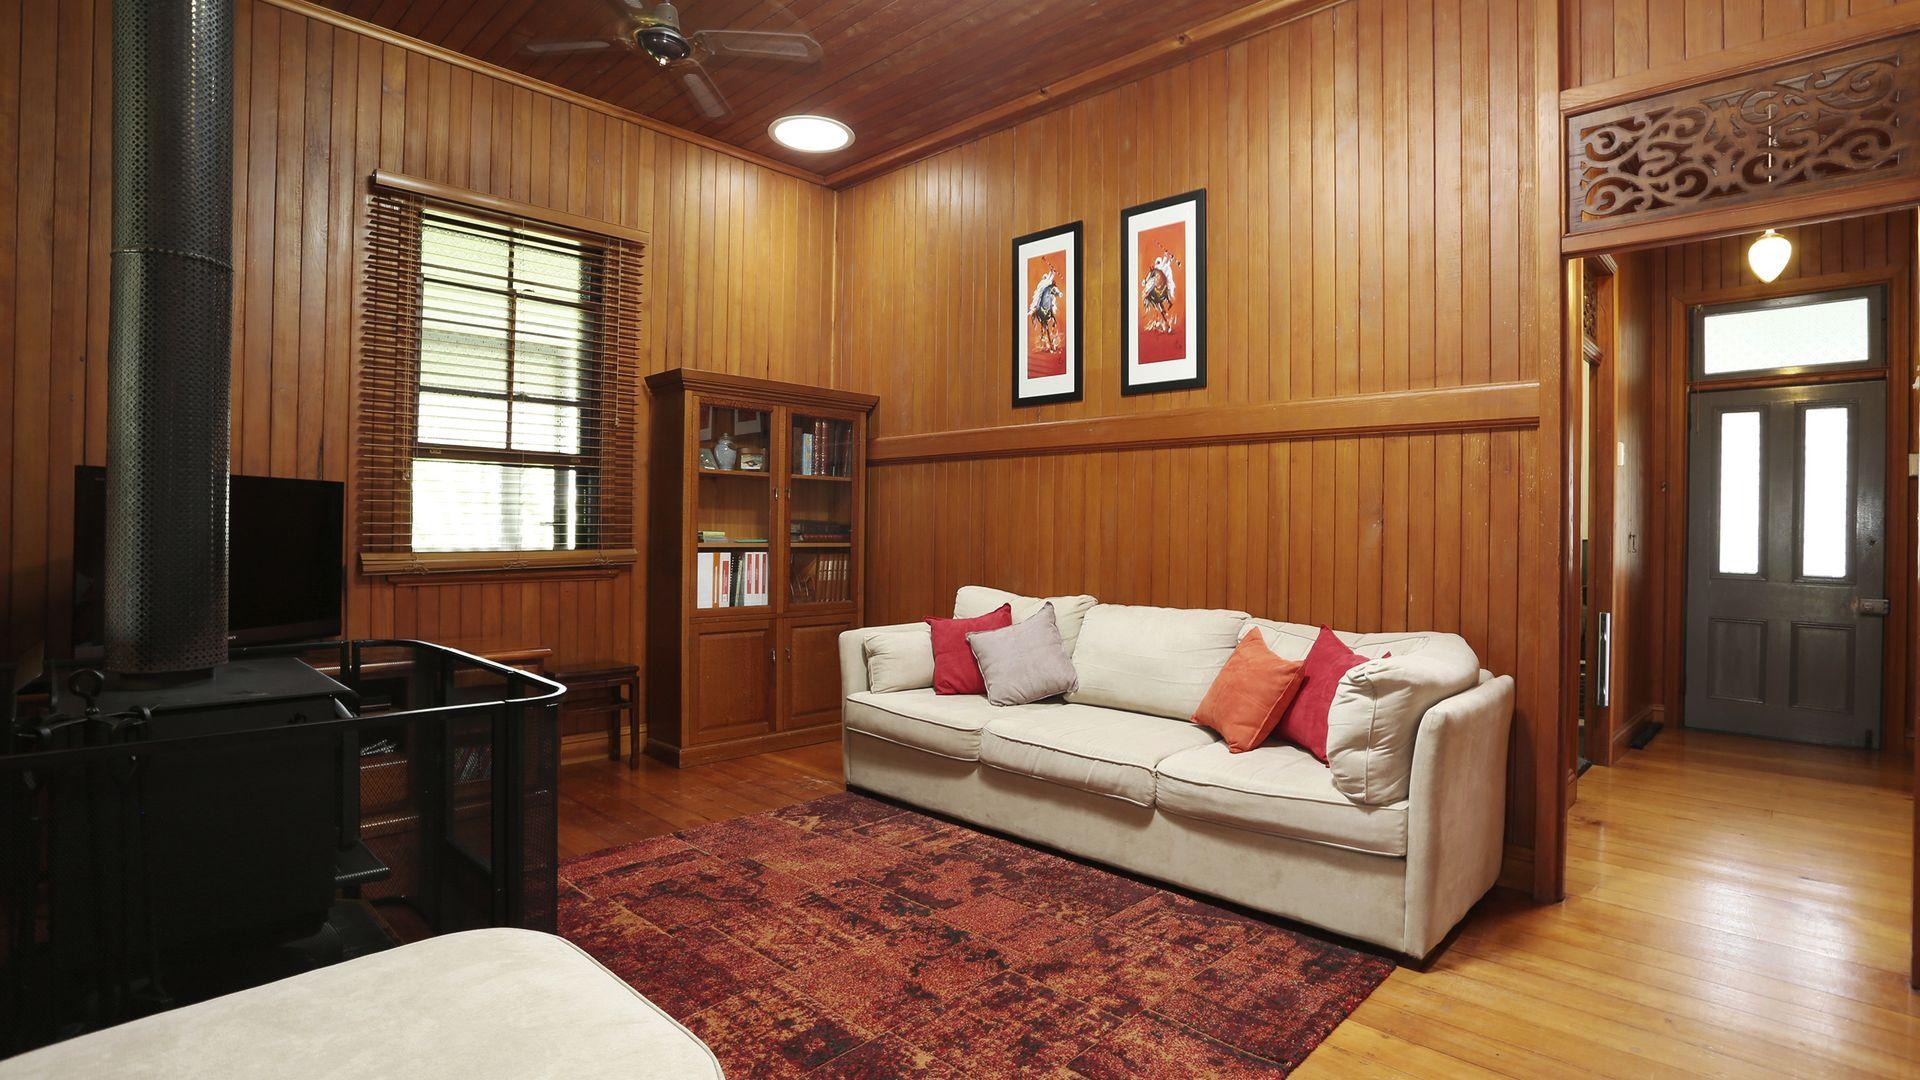 119 Pine Mountain Rd, Brassall QLD 4305, Image 2